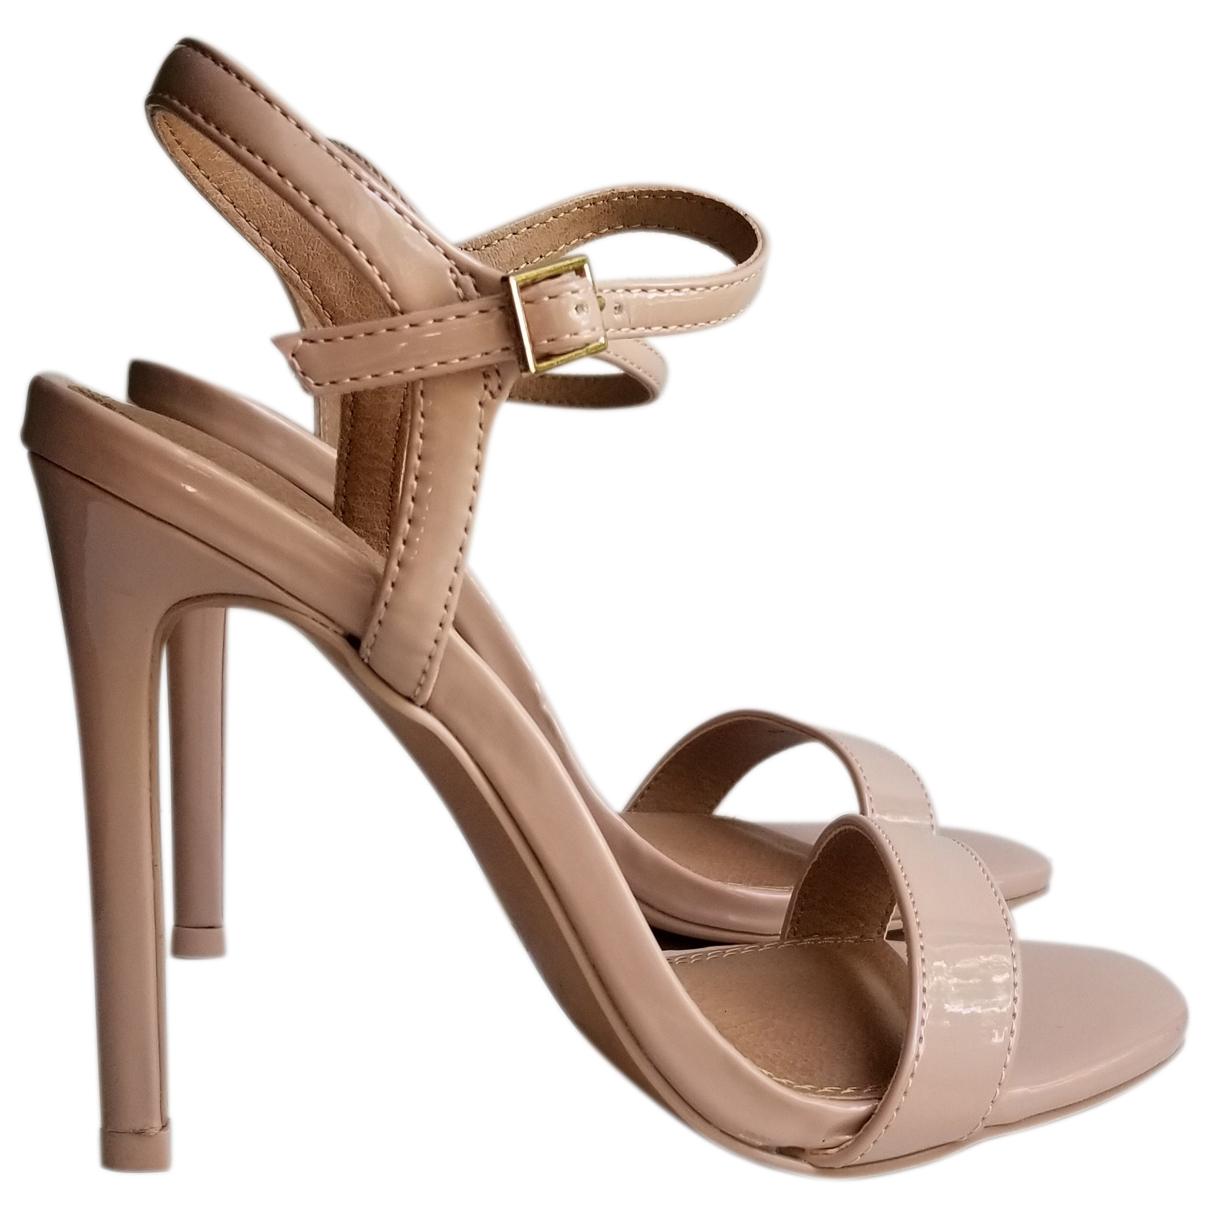 Asos N Beige Sandals for Women 35 EU